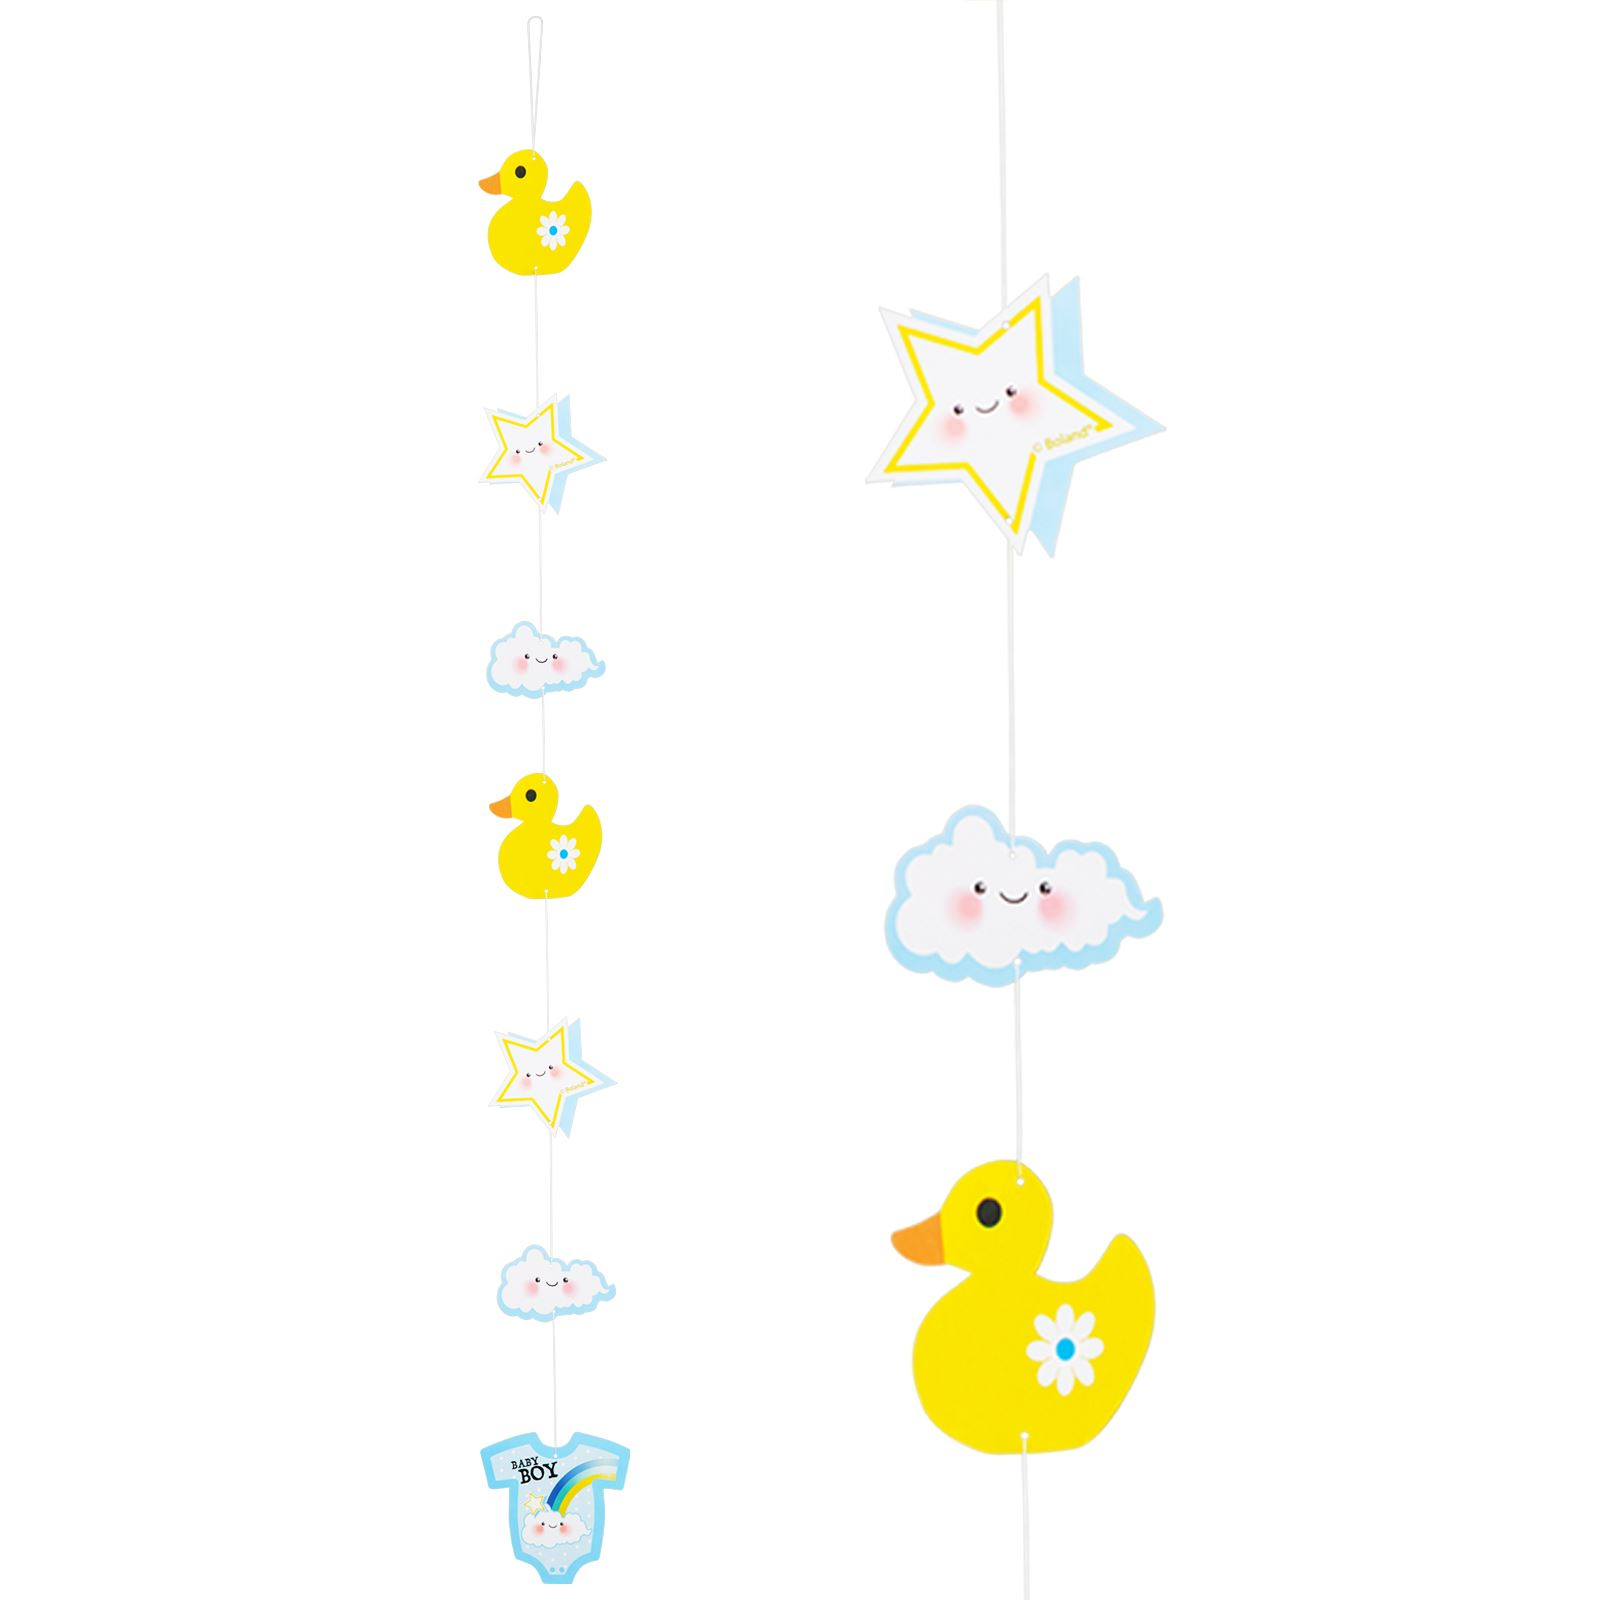 Recien-Nacido-Baby-Shower-Nino-Nina-Azul-Rosa-Pancarta-nino-o-Nina-Fiesta-CUERDA